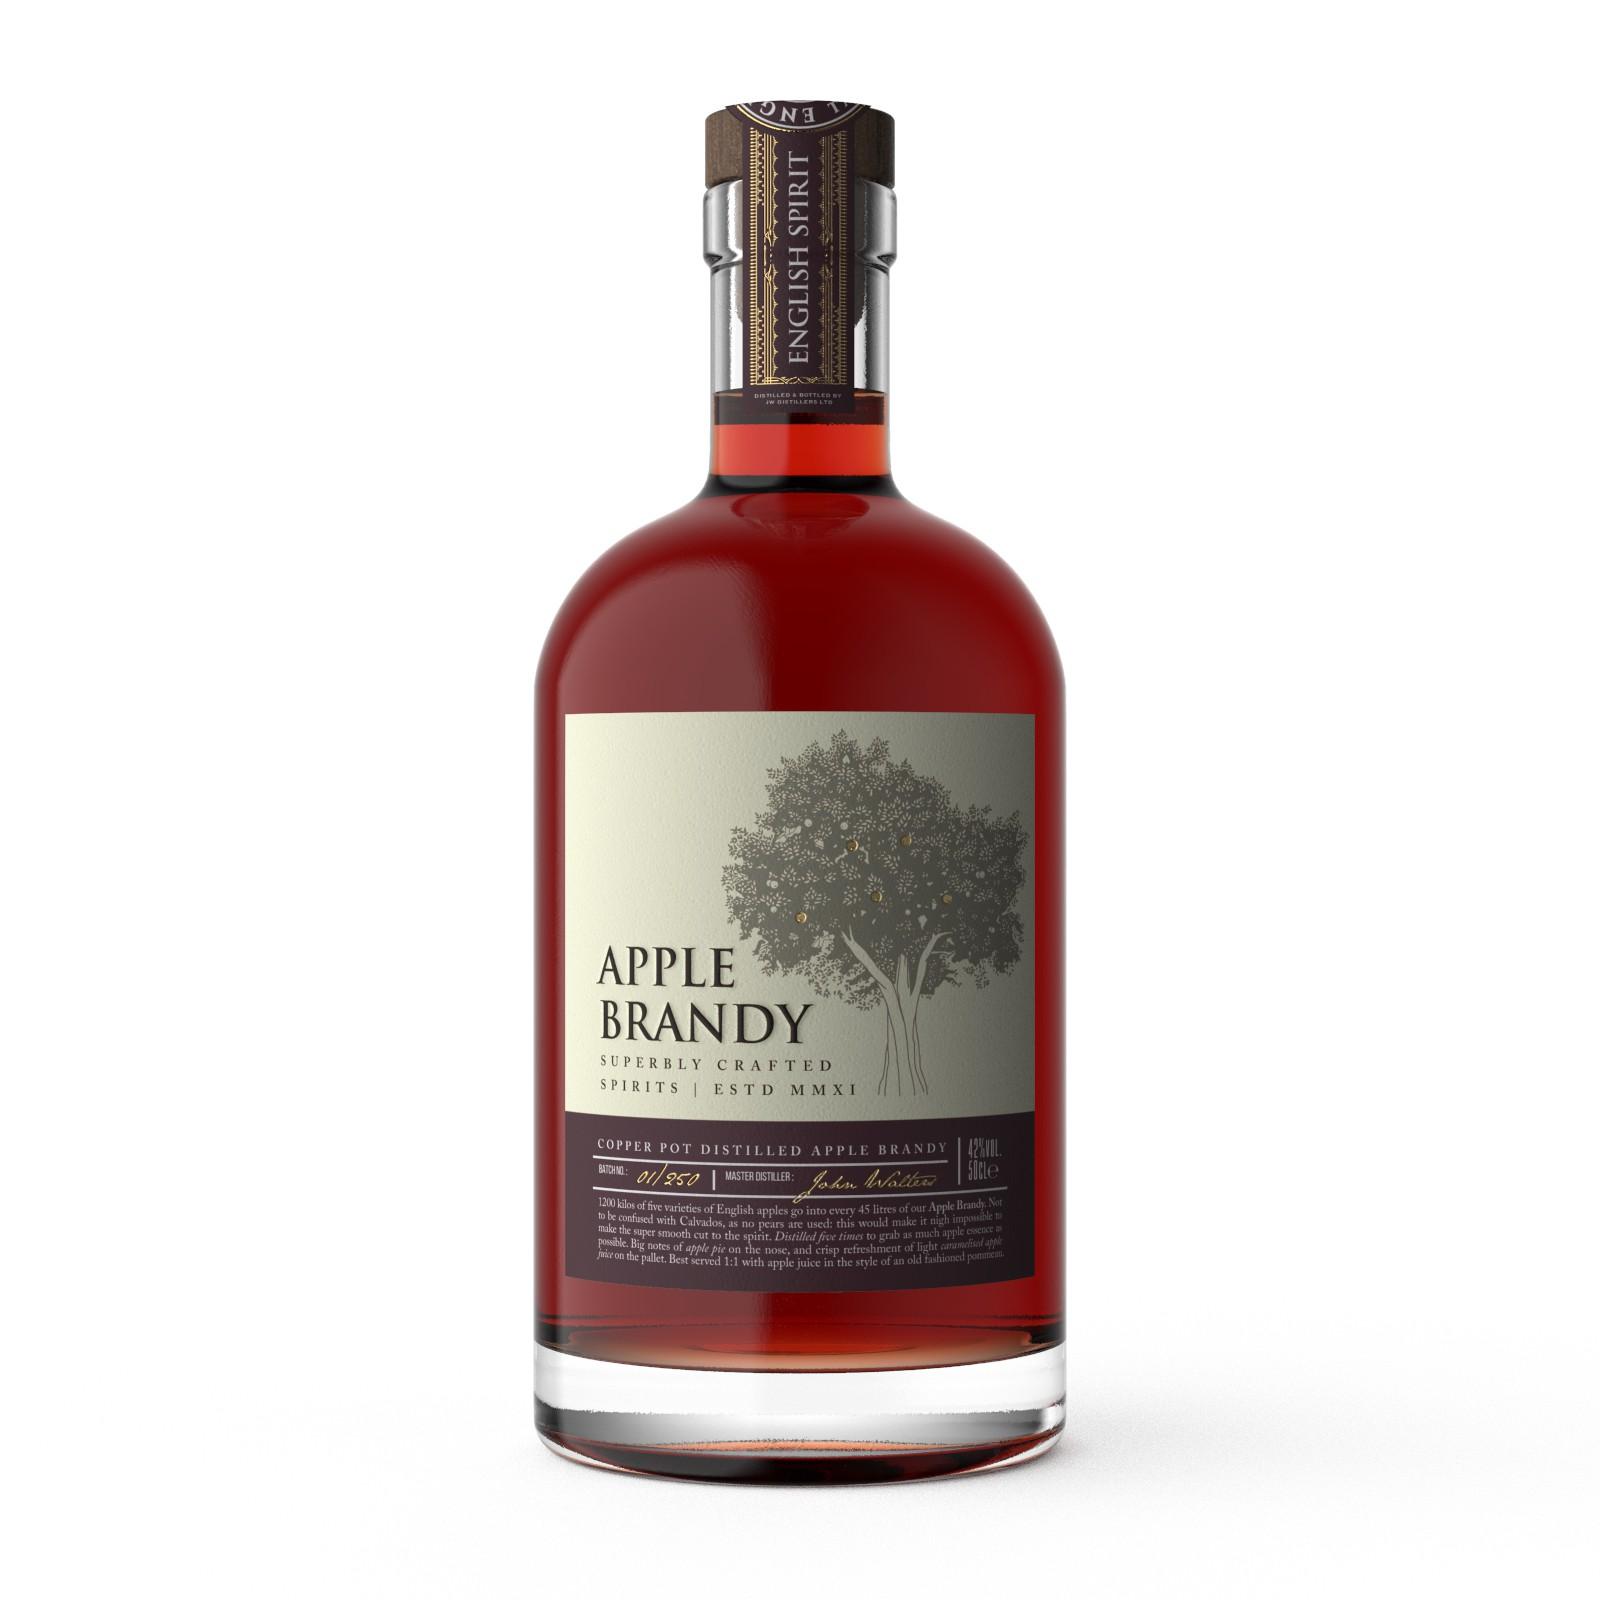 Label design for Apple Brandy